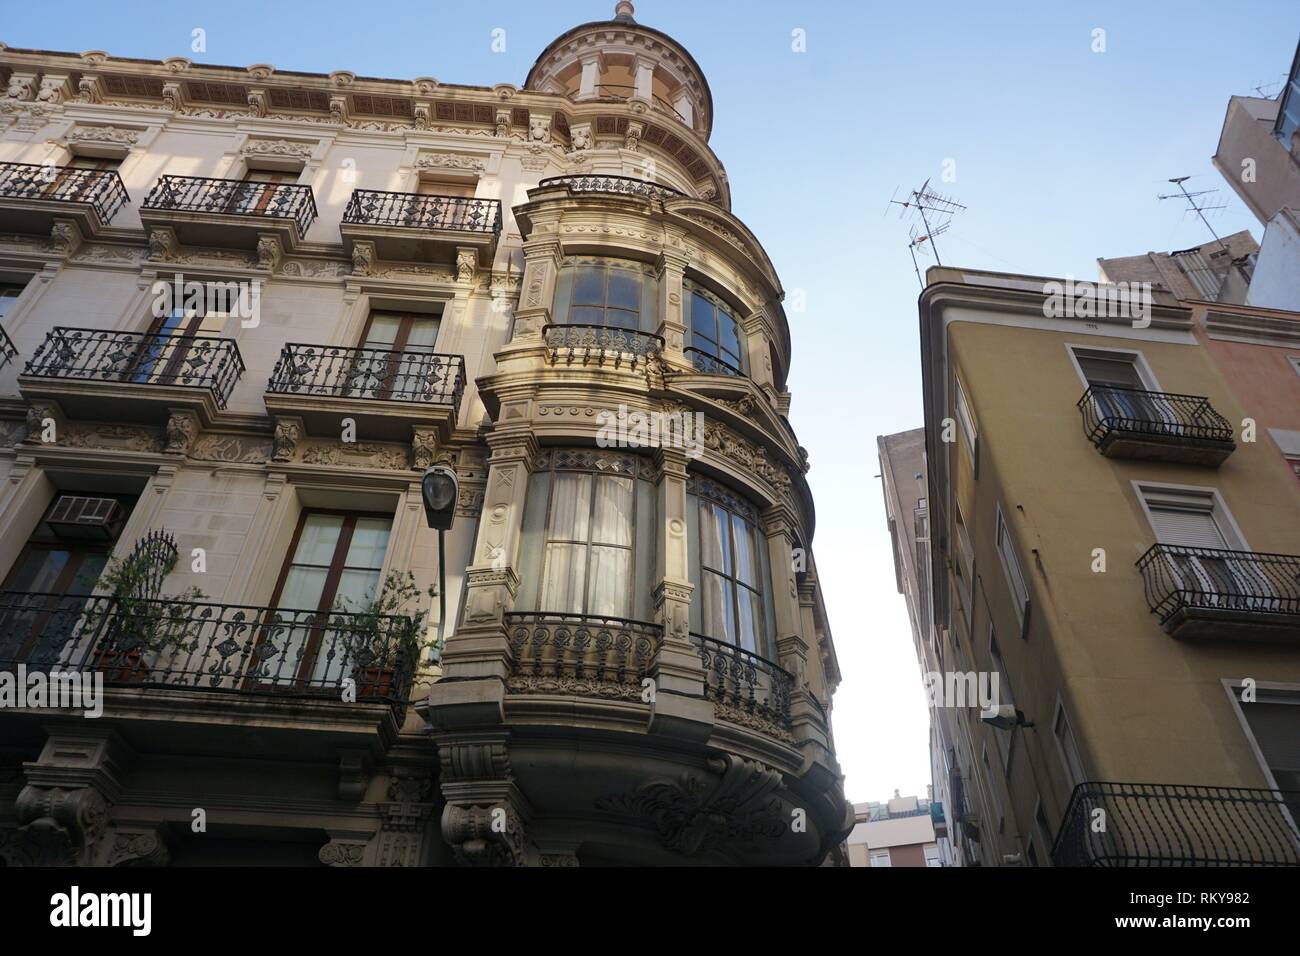 Architect Francesc Borras Soler's Casa Boule, also known as Cal Guardiola-Boule. Reus, Tarragona, Catalonia, Spain, Europe, - Stock Image